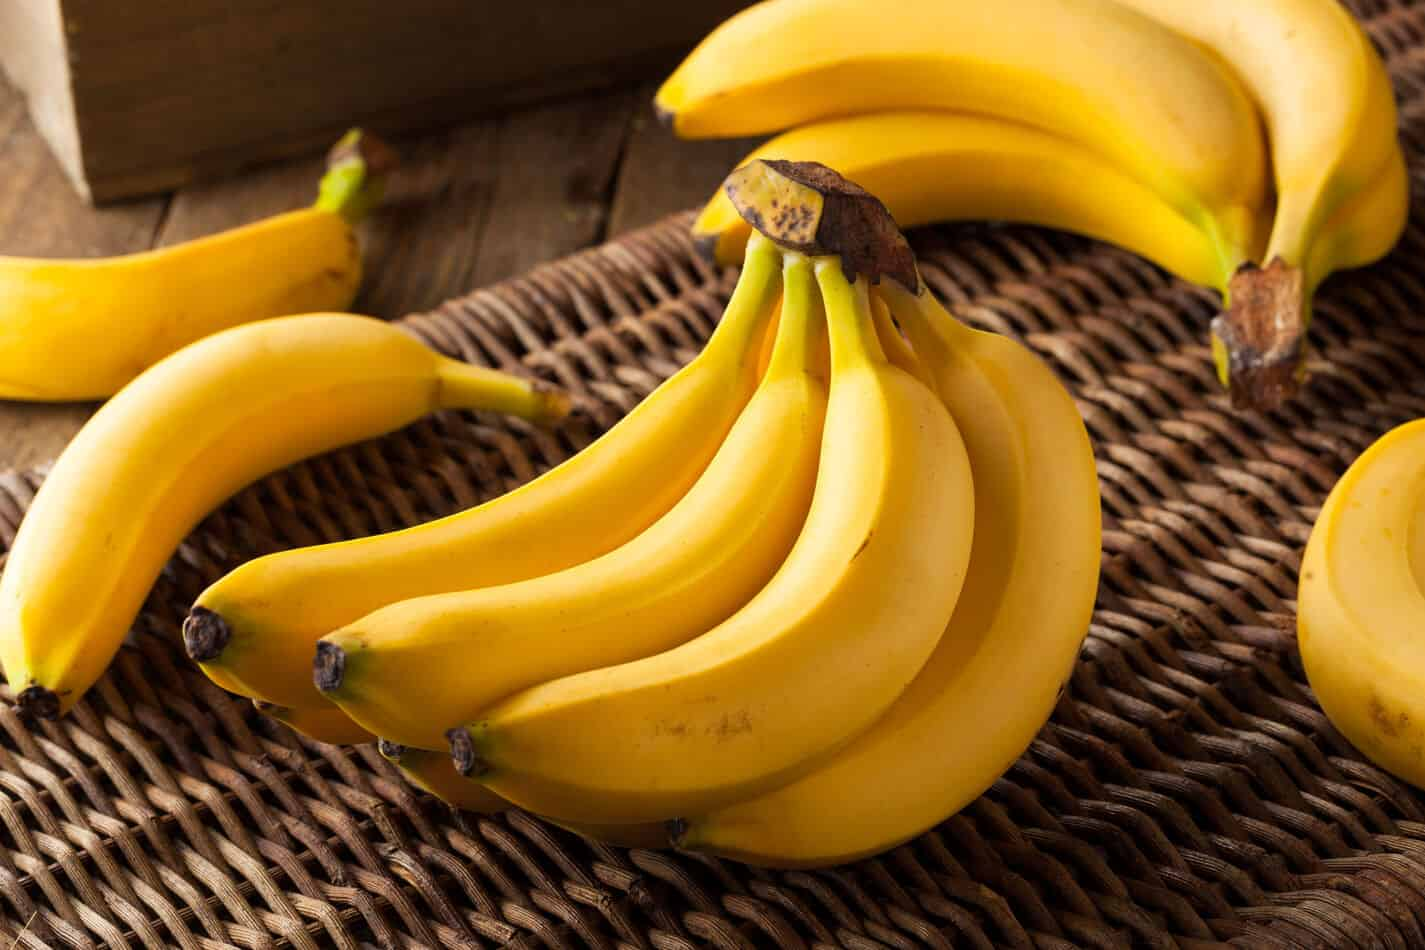 Can Great Danes Eat Bananas?